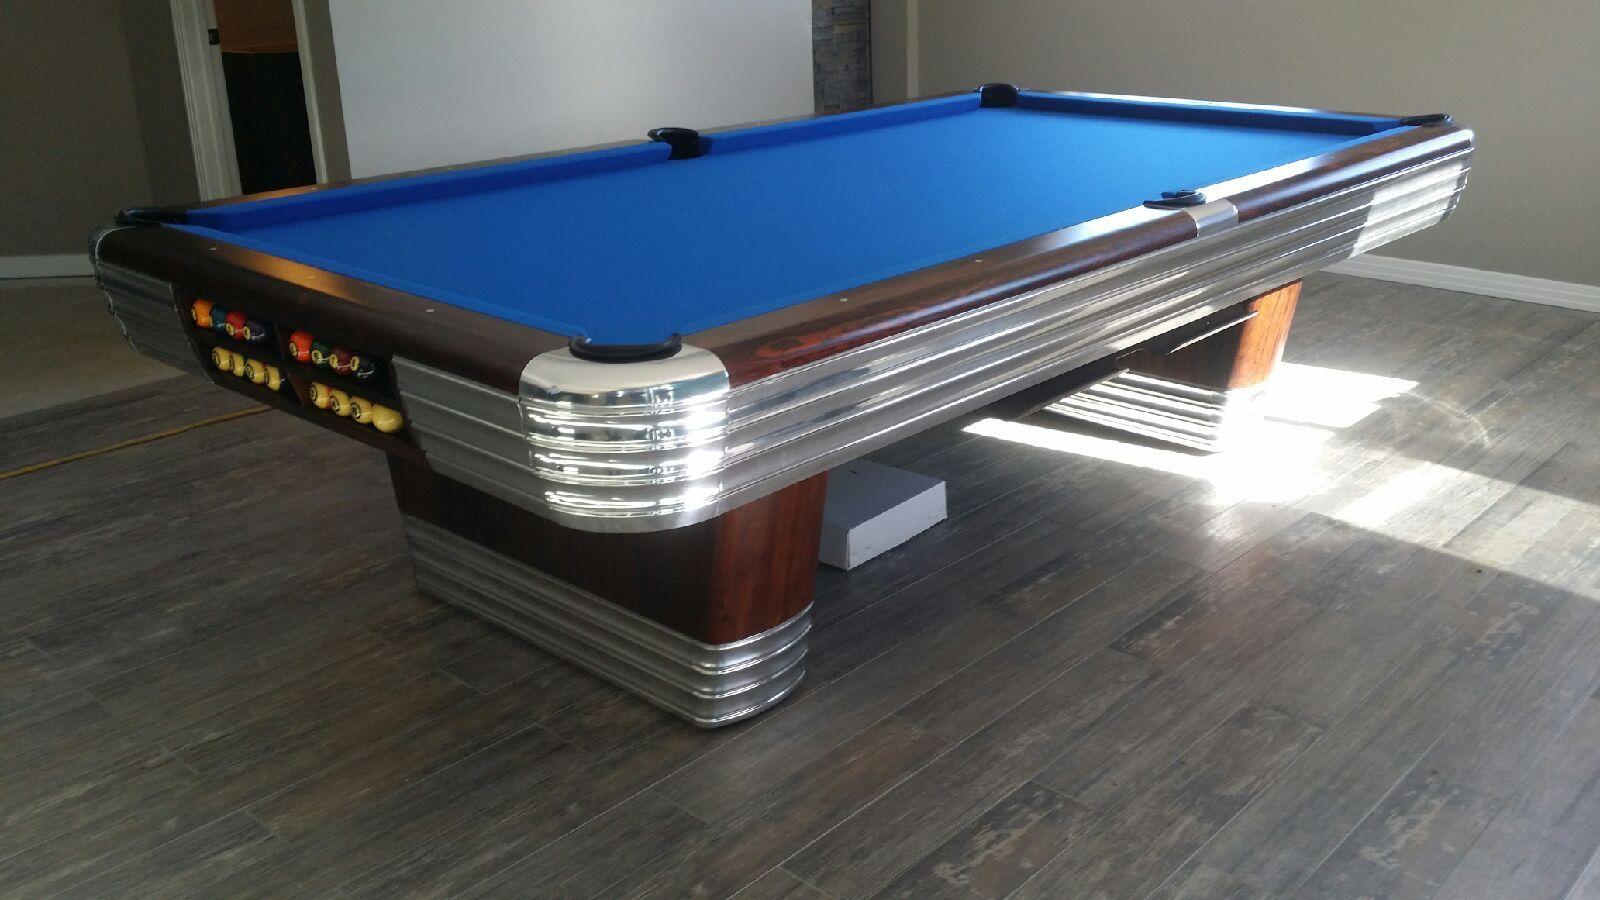 1945 9u0027 Brunswick Centennial Pool Table   Colorado Pool Table Guys: The Pool  Table